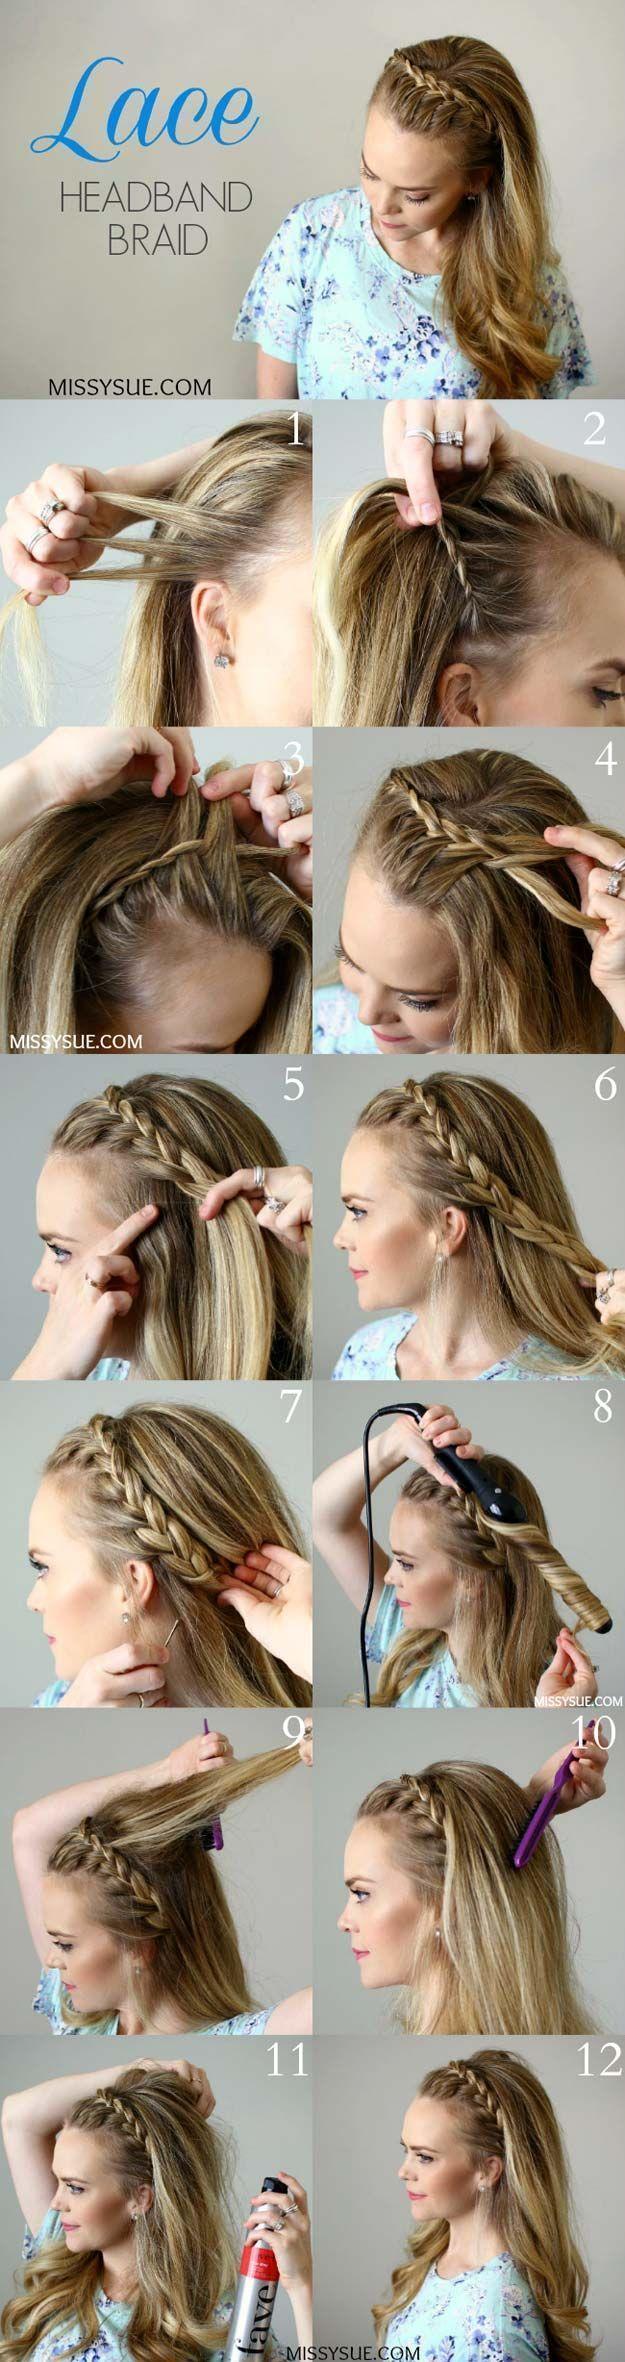 Best Hair Braiding Tutorials Lace Headband Braid Easy Step by